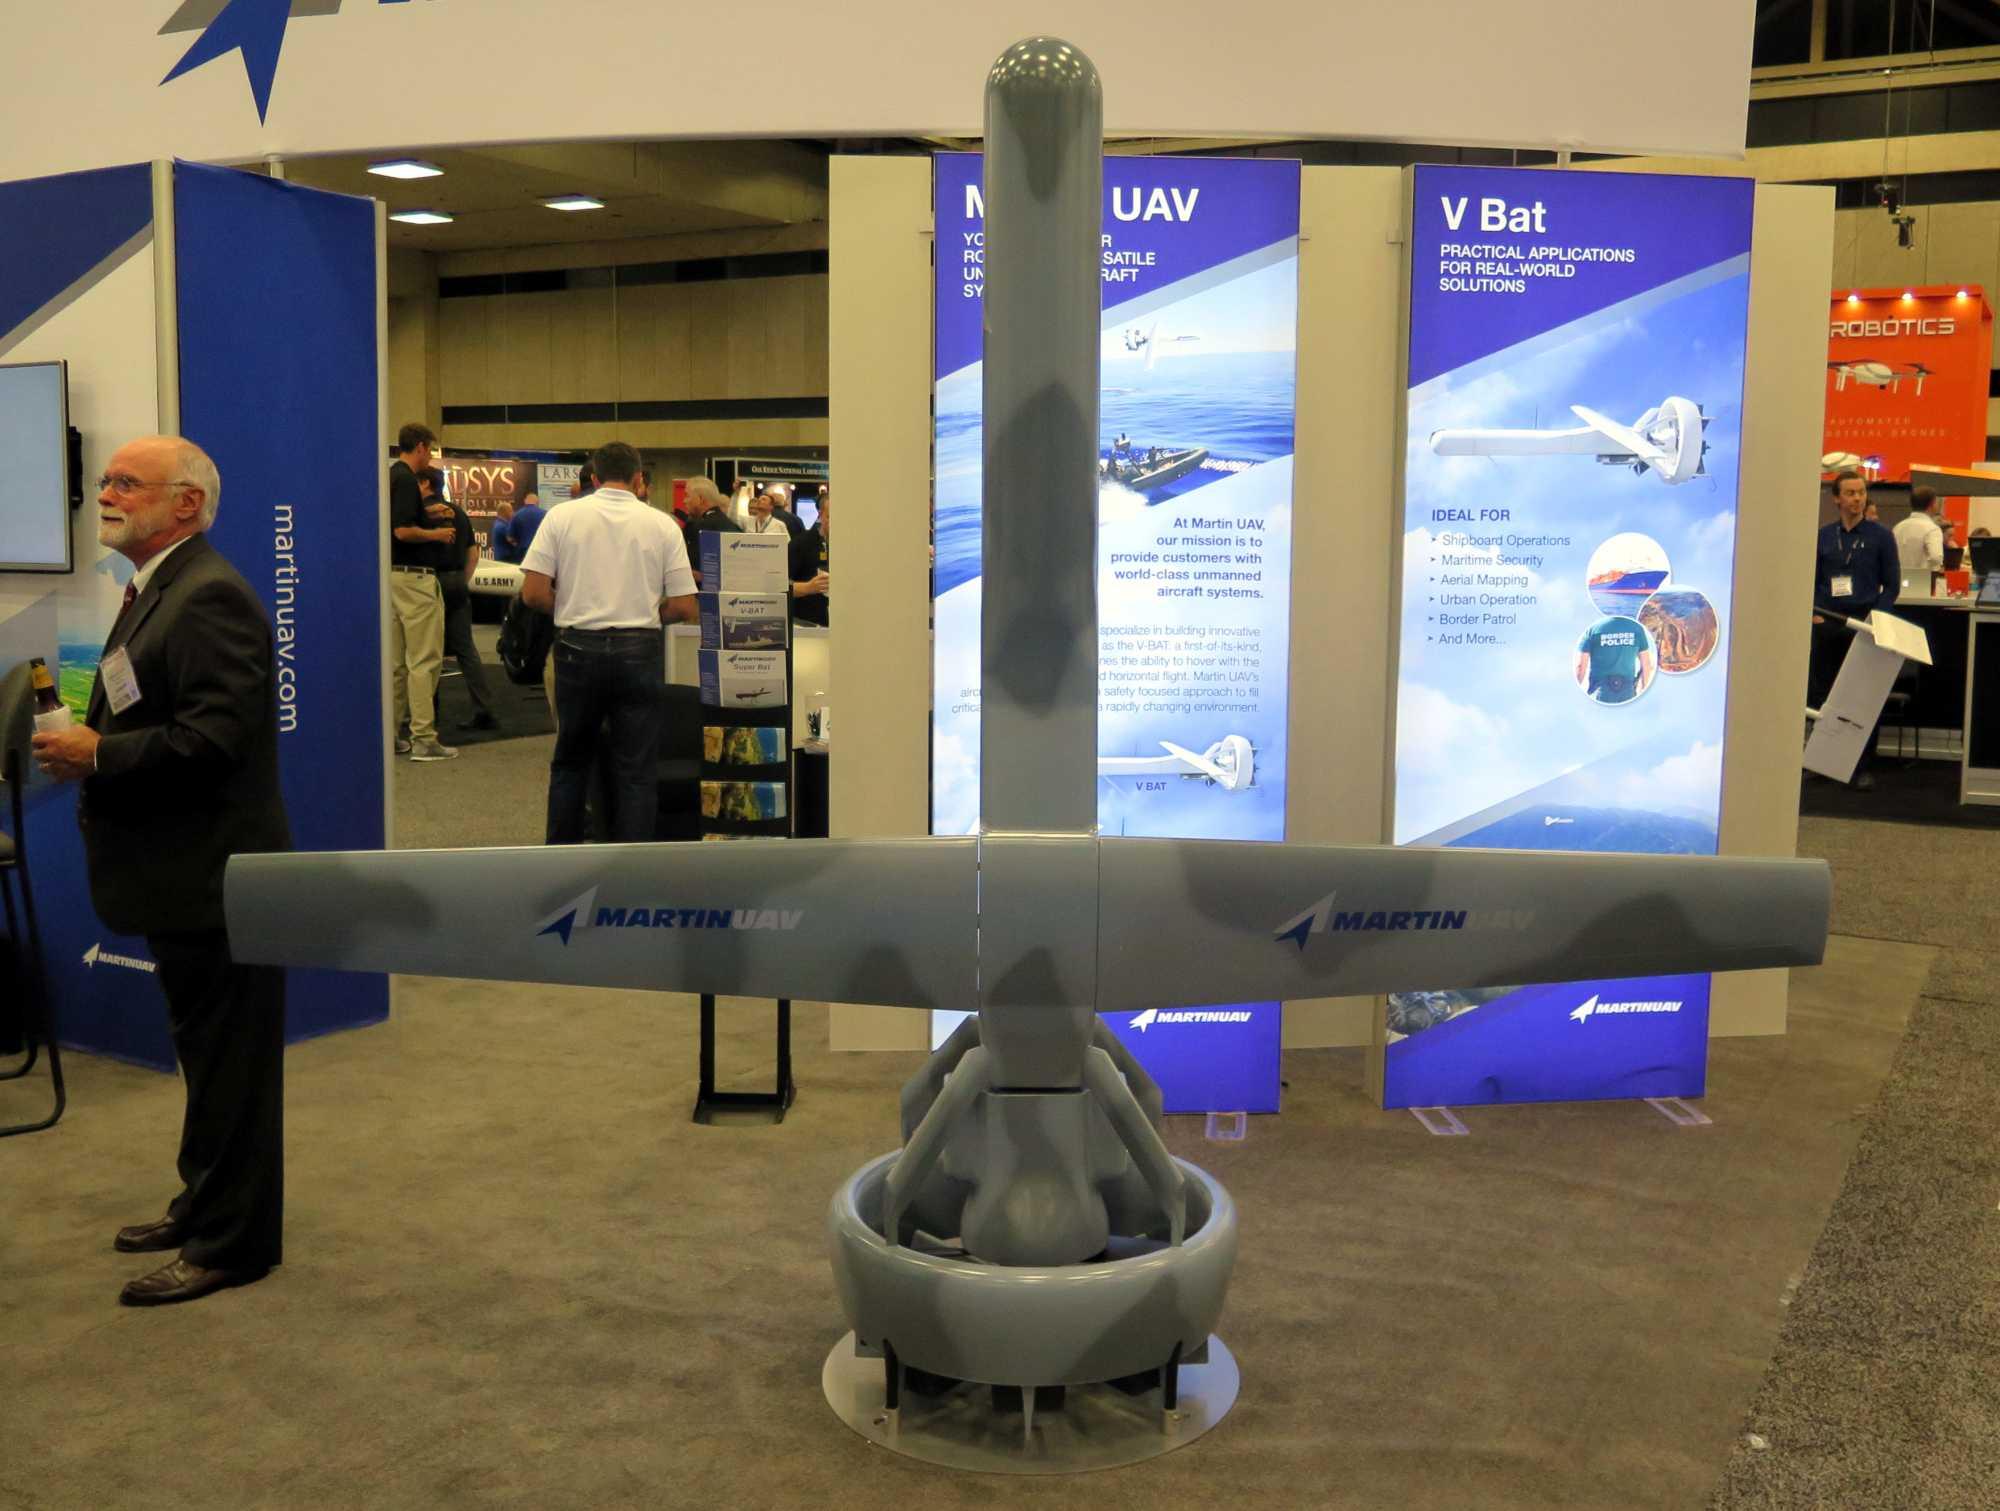 Senkrecht stehende Drohne im Militärgrau